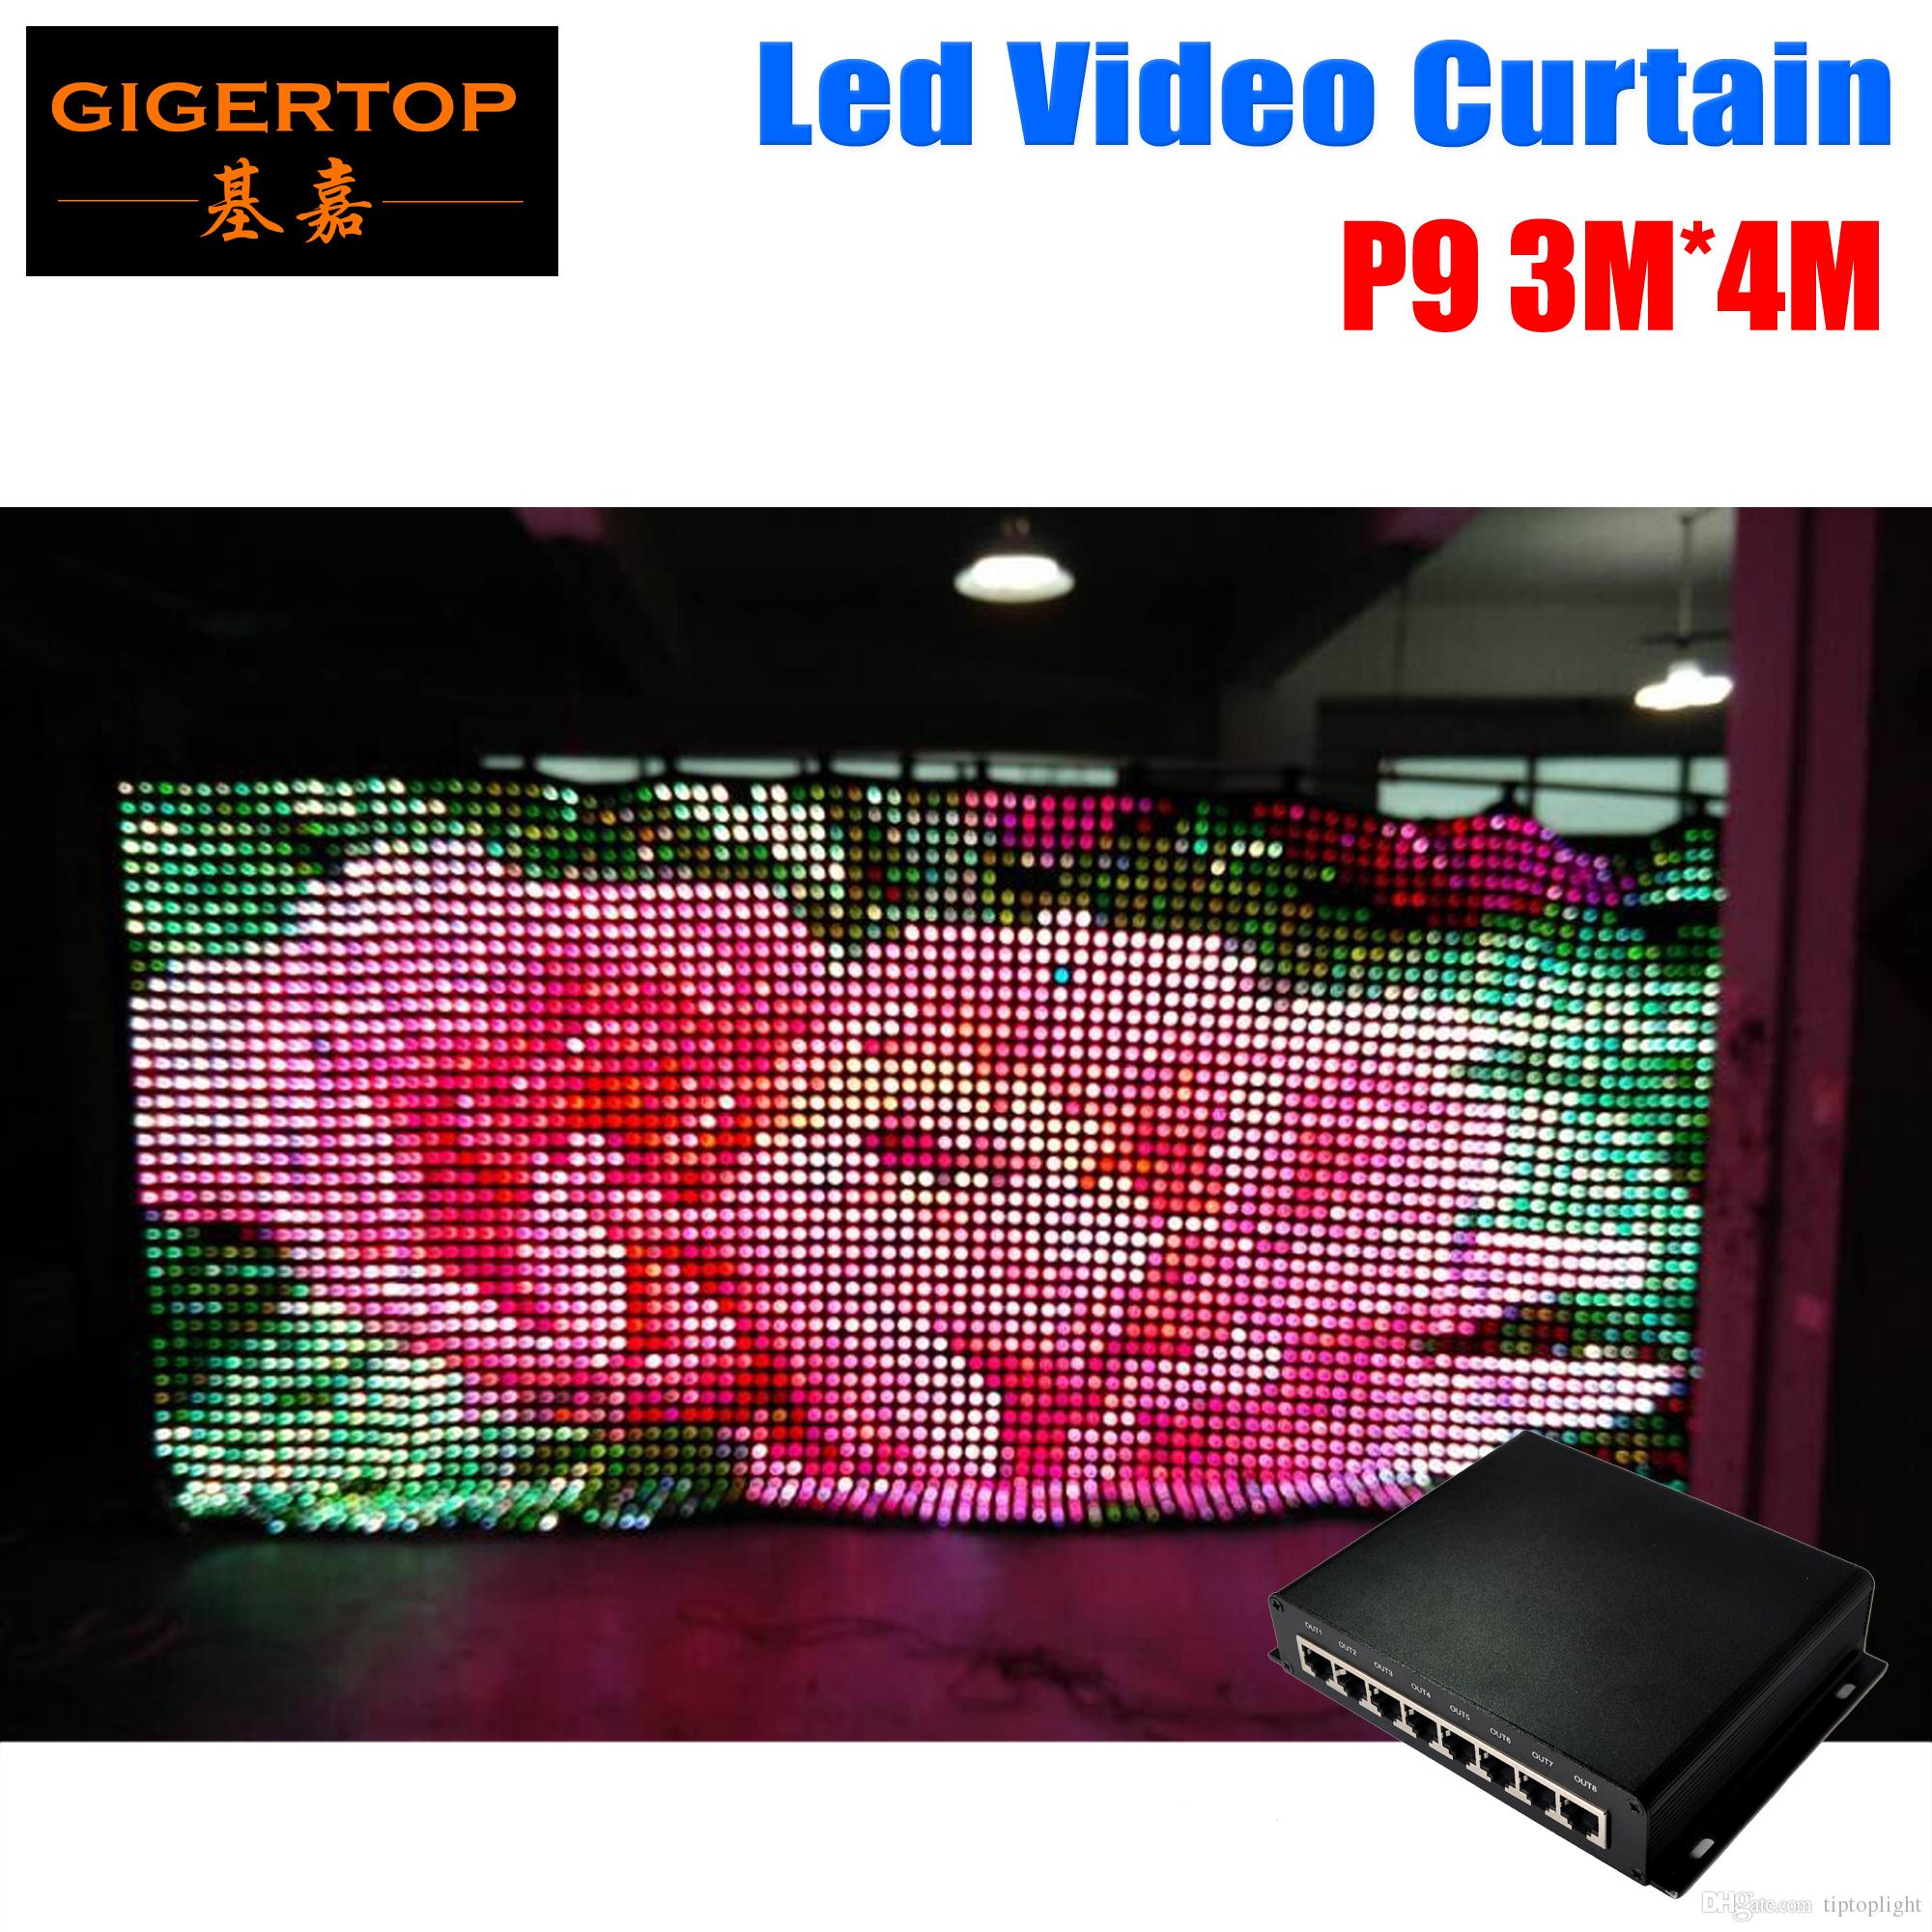 P9 3M * 4M Modo de PC Led Video de cortina DJ Fondo de escenario 1200pcs 3in1 Led cortina con 80 tipos patrón de escenario de la boda telón de fondo